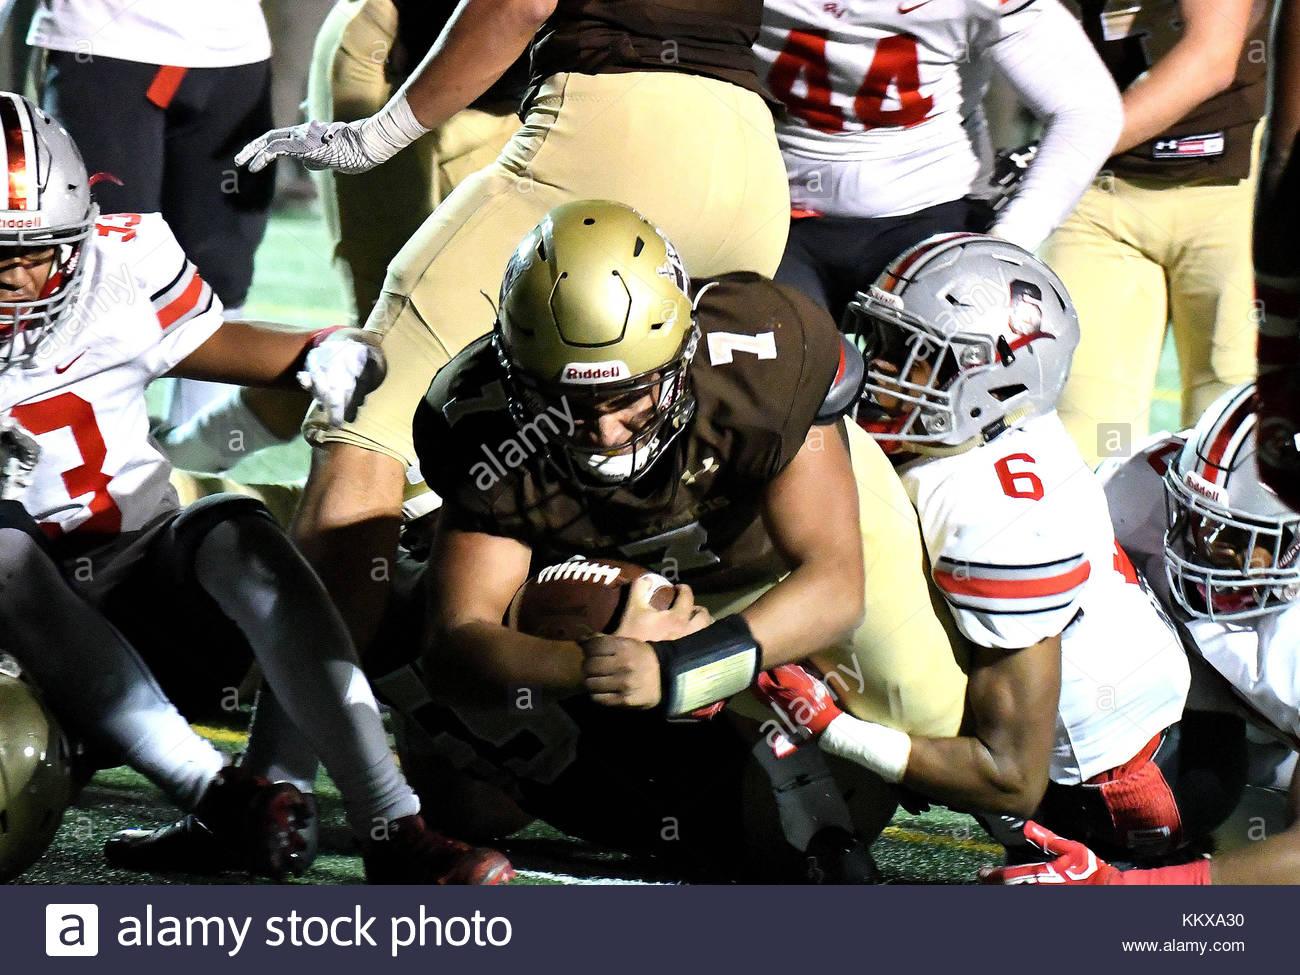 La Canada, California, USA. 1st Dec, 2017. St. Francis quarterback Darius Perrantes (7) dives for the touchdown - Stock Image